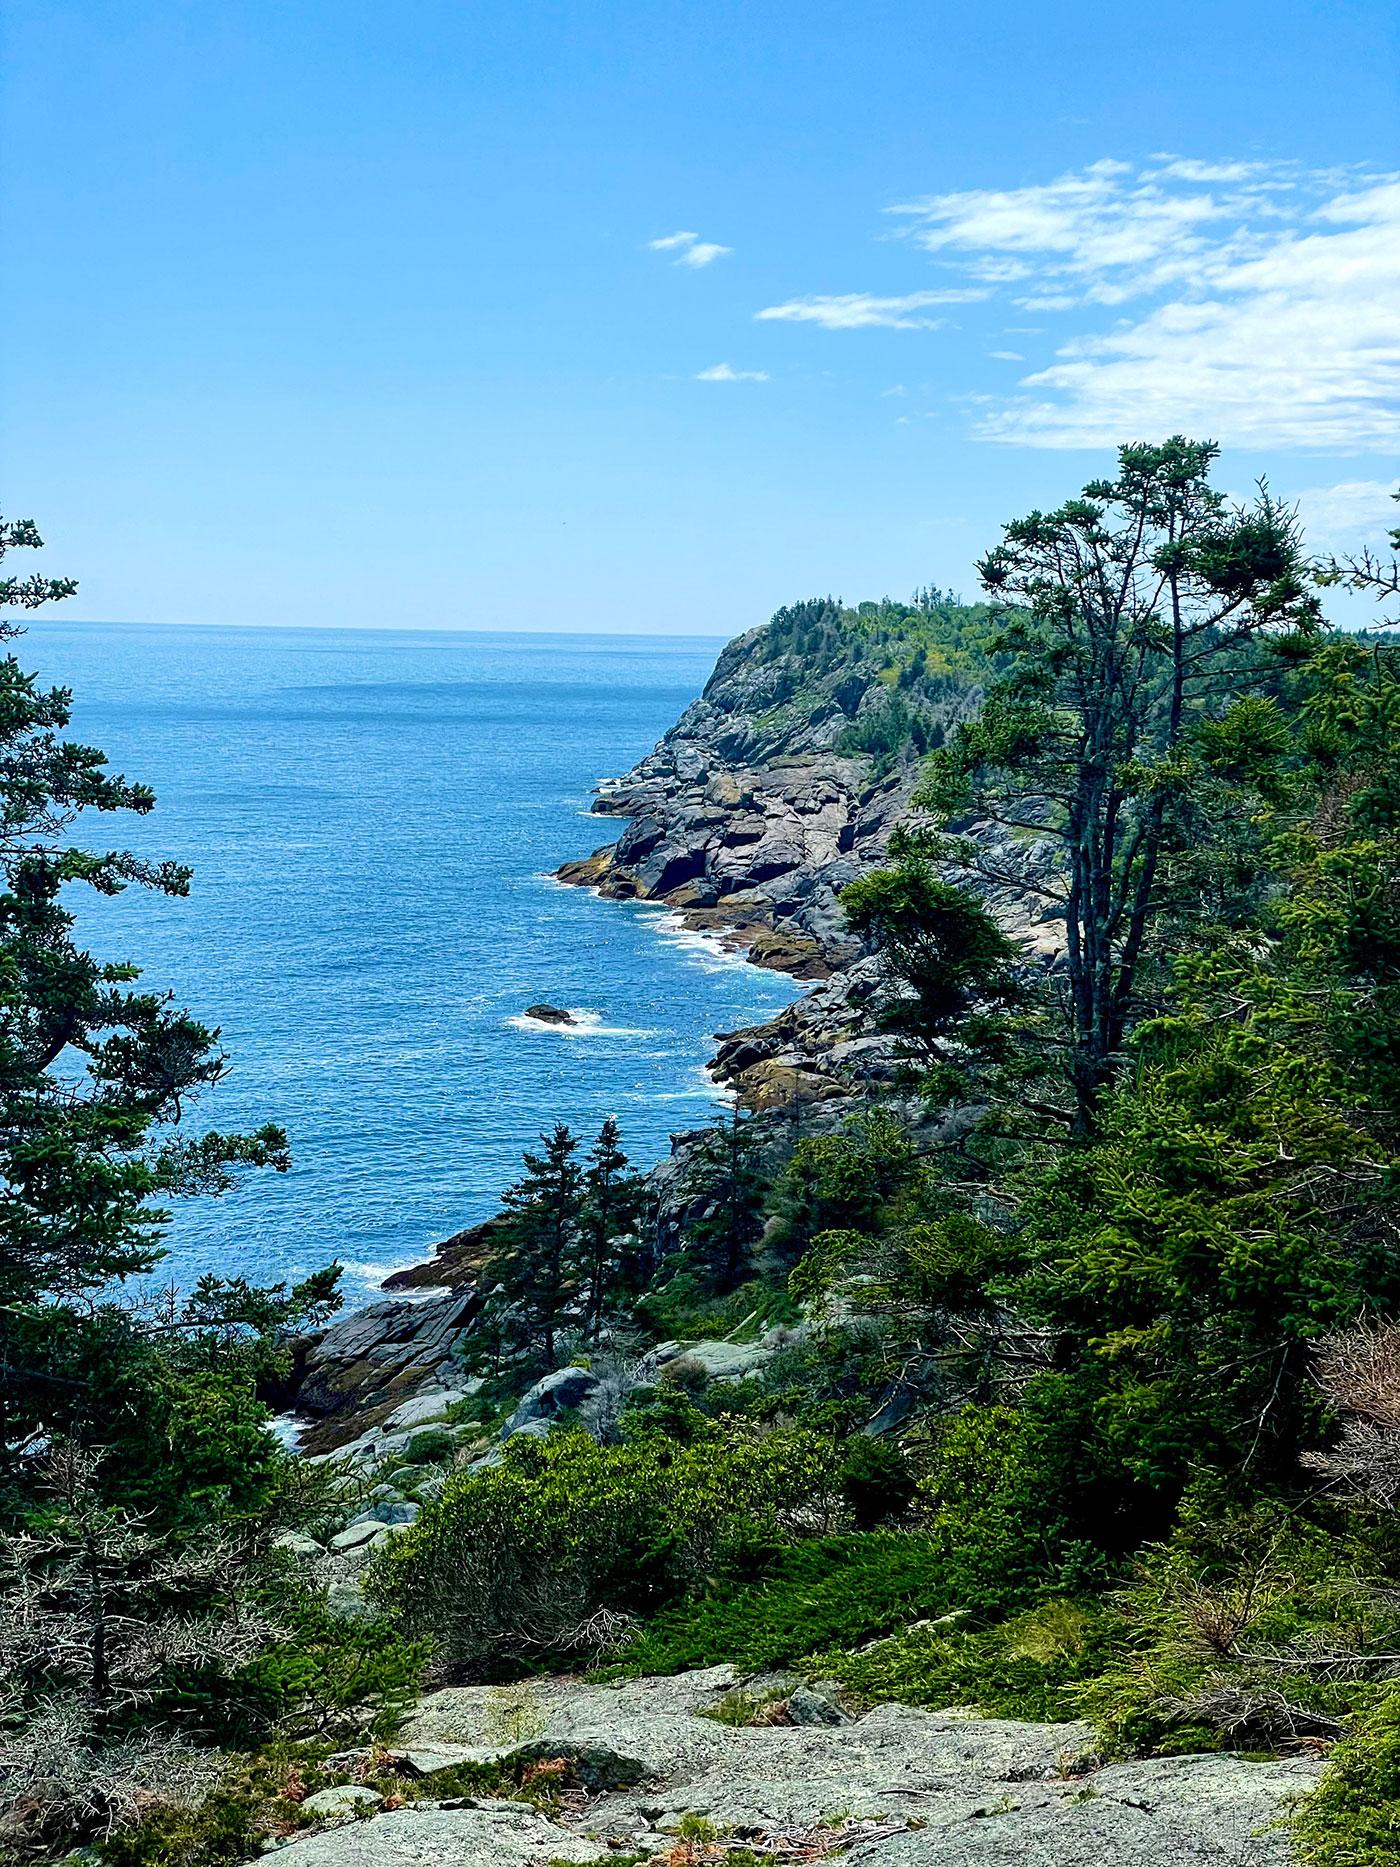 rocky Maine coast with trees